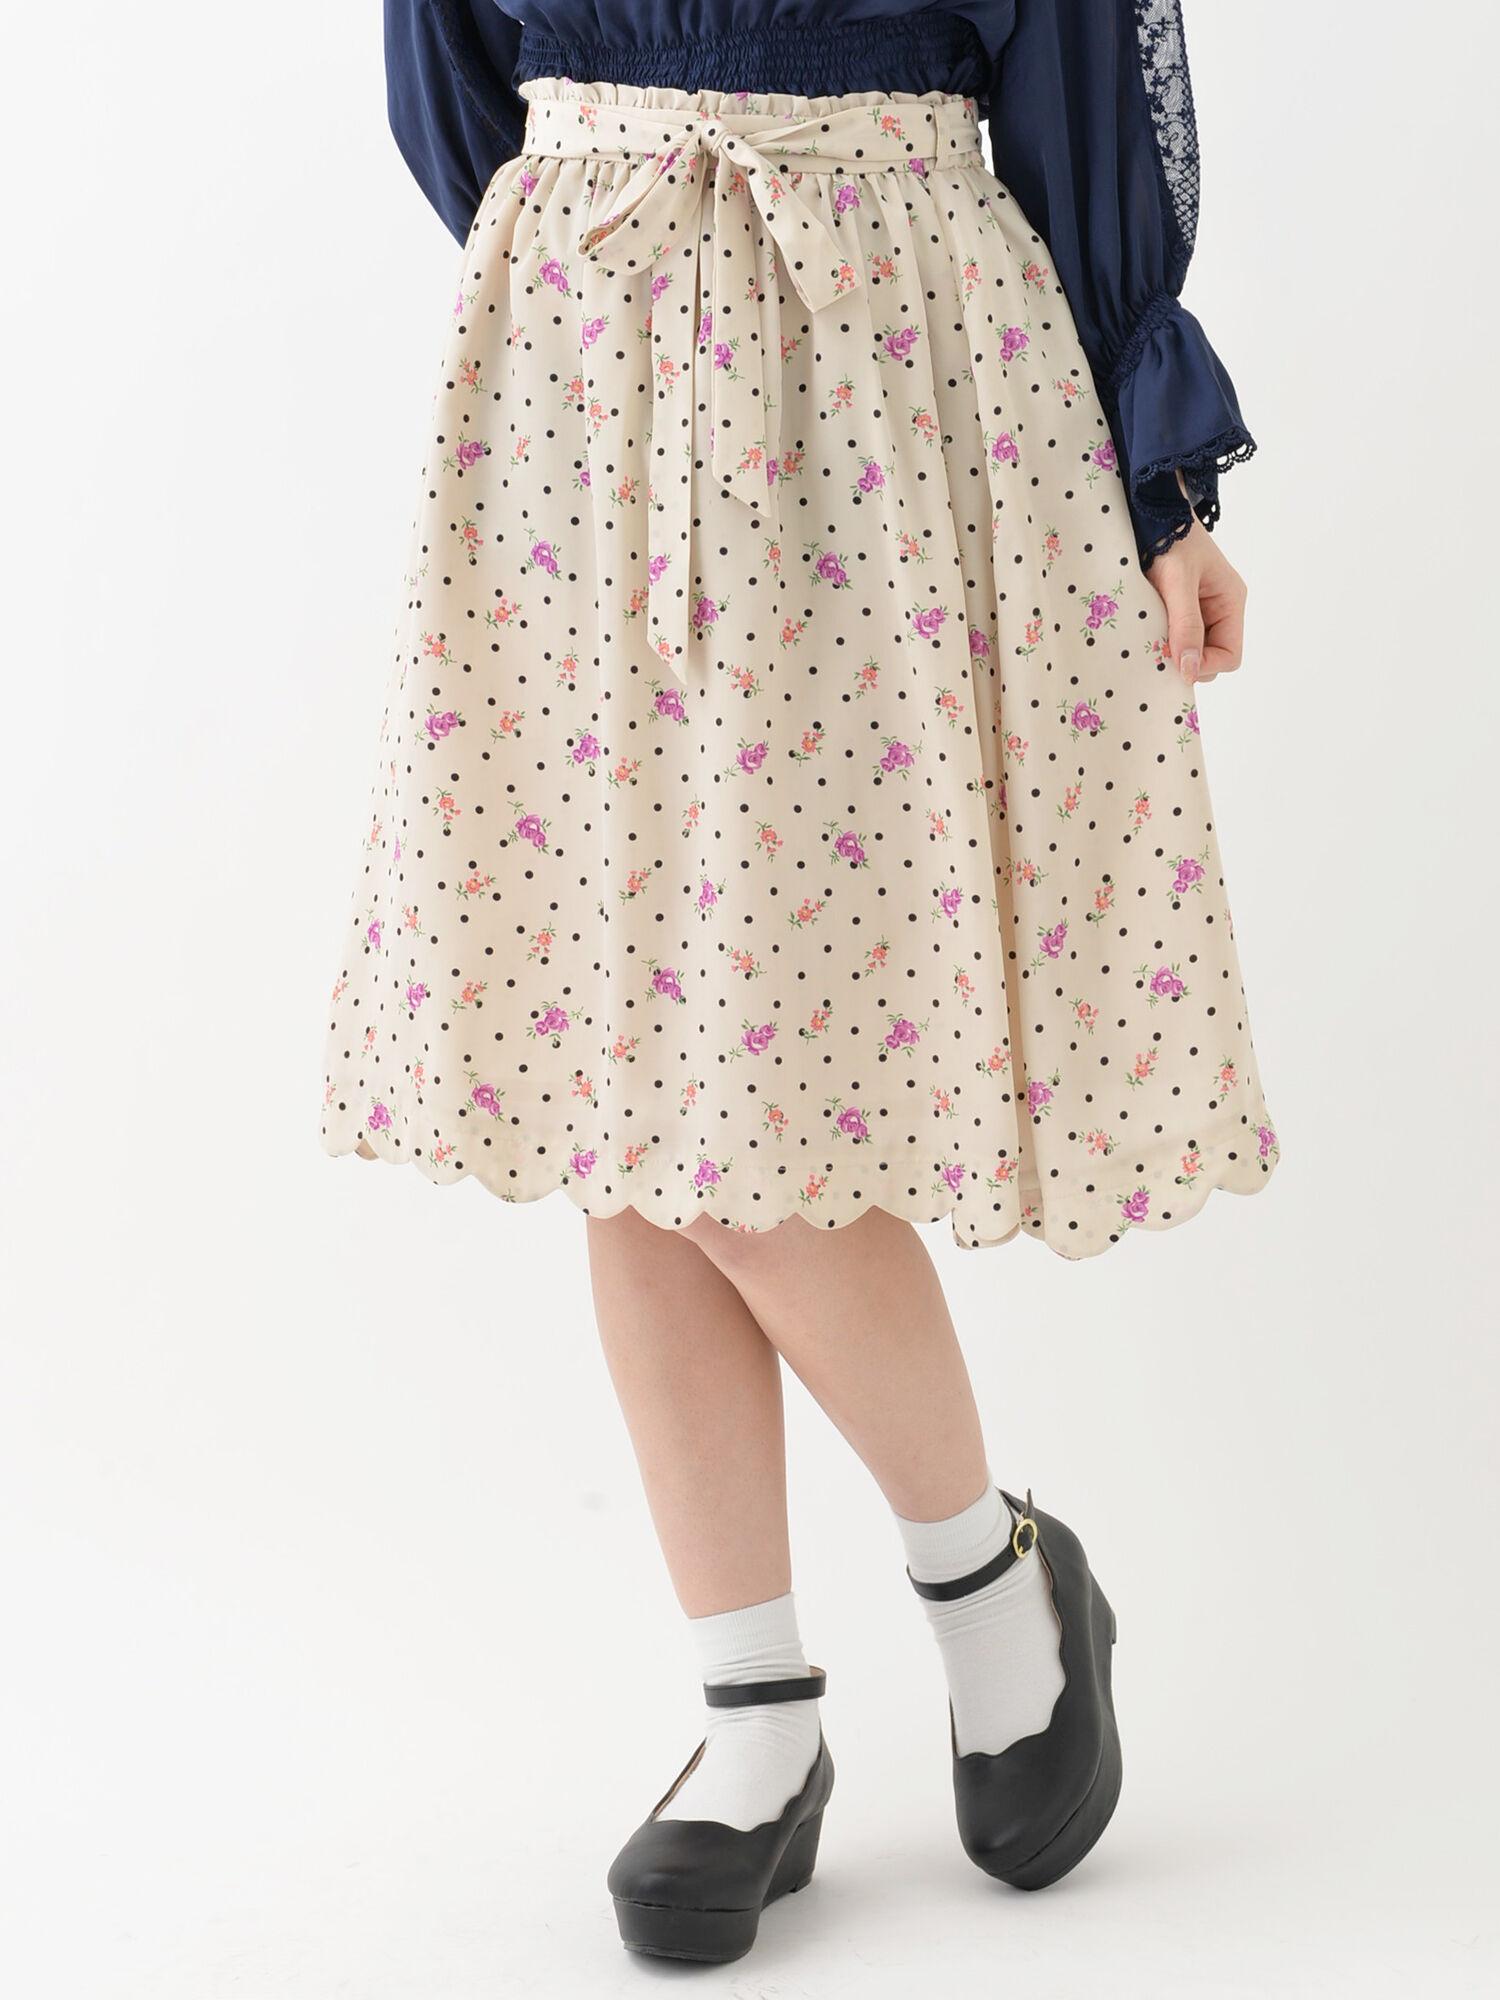 ★【Rune】フラワープリントスカート